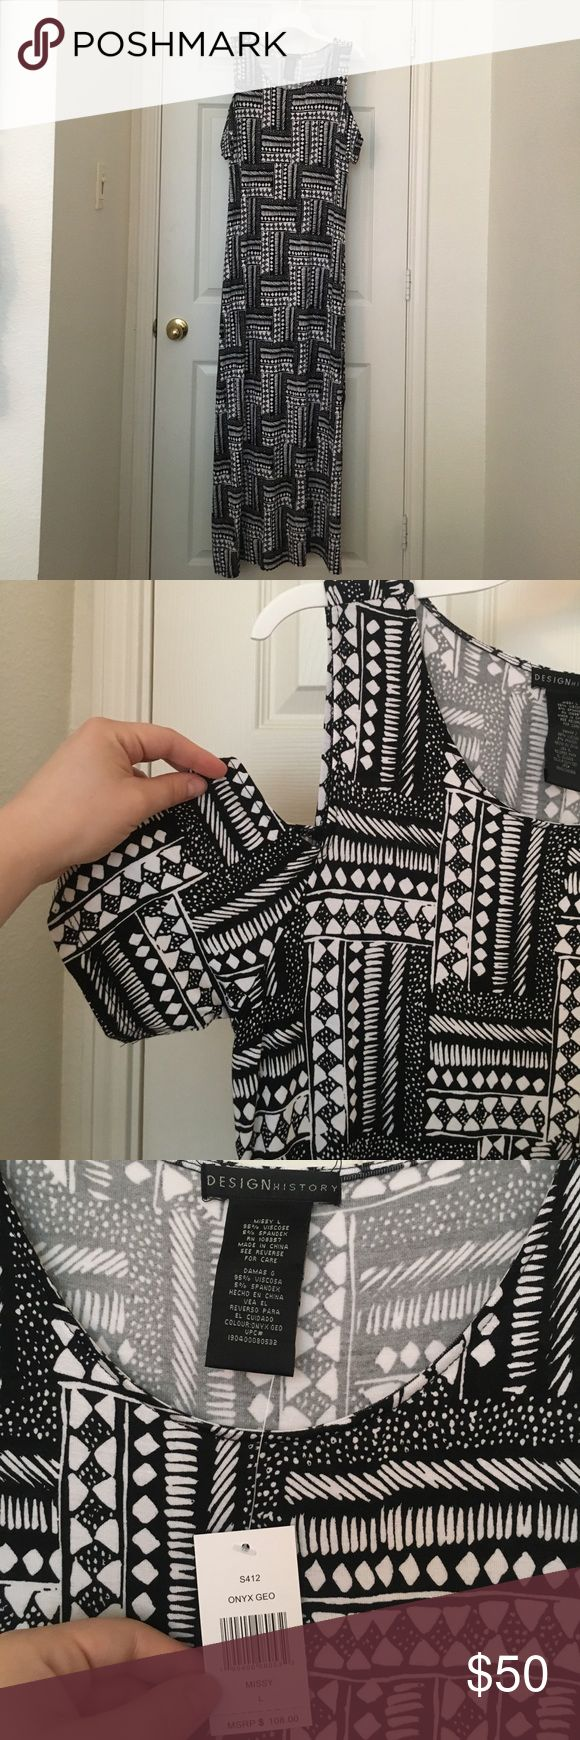 DESIGN HISTORY black and white maxi dress. Design history black and white onyx geo print maxi dress. Cold shoulder sleeve. Design History Dresses Maxi